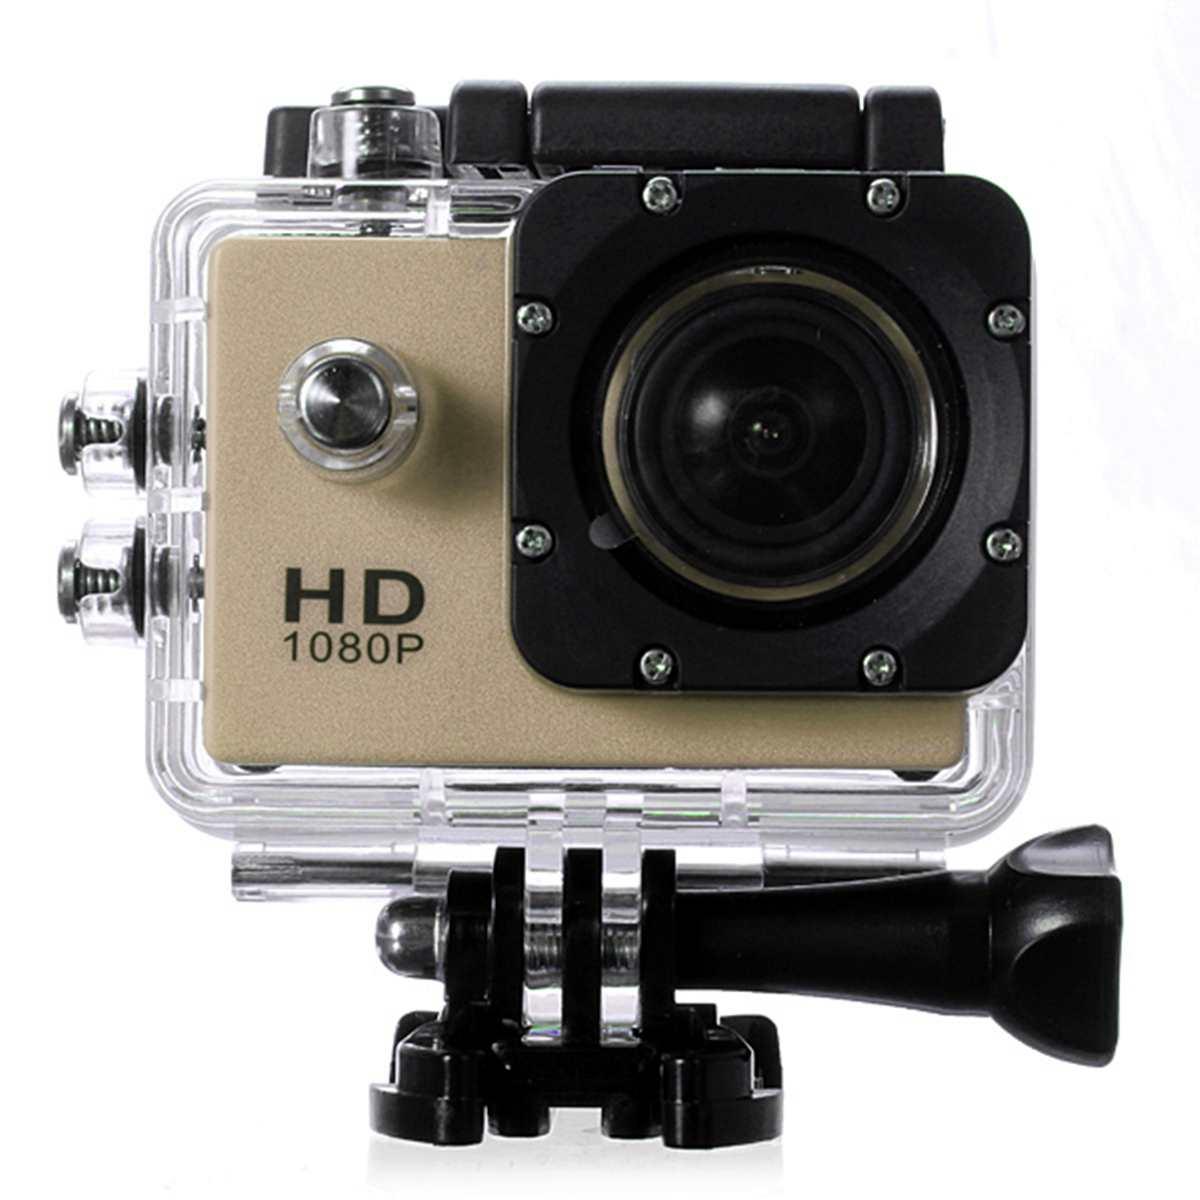 SJ4000 Sport DV 170 Degree HD Video Photo Action Underwater 30M Waterproof Case Camera Black White Silver Yellow Blue Gold